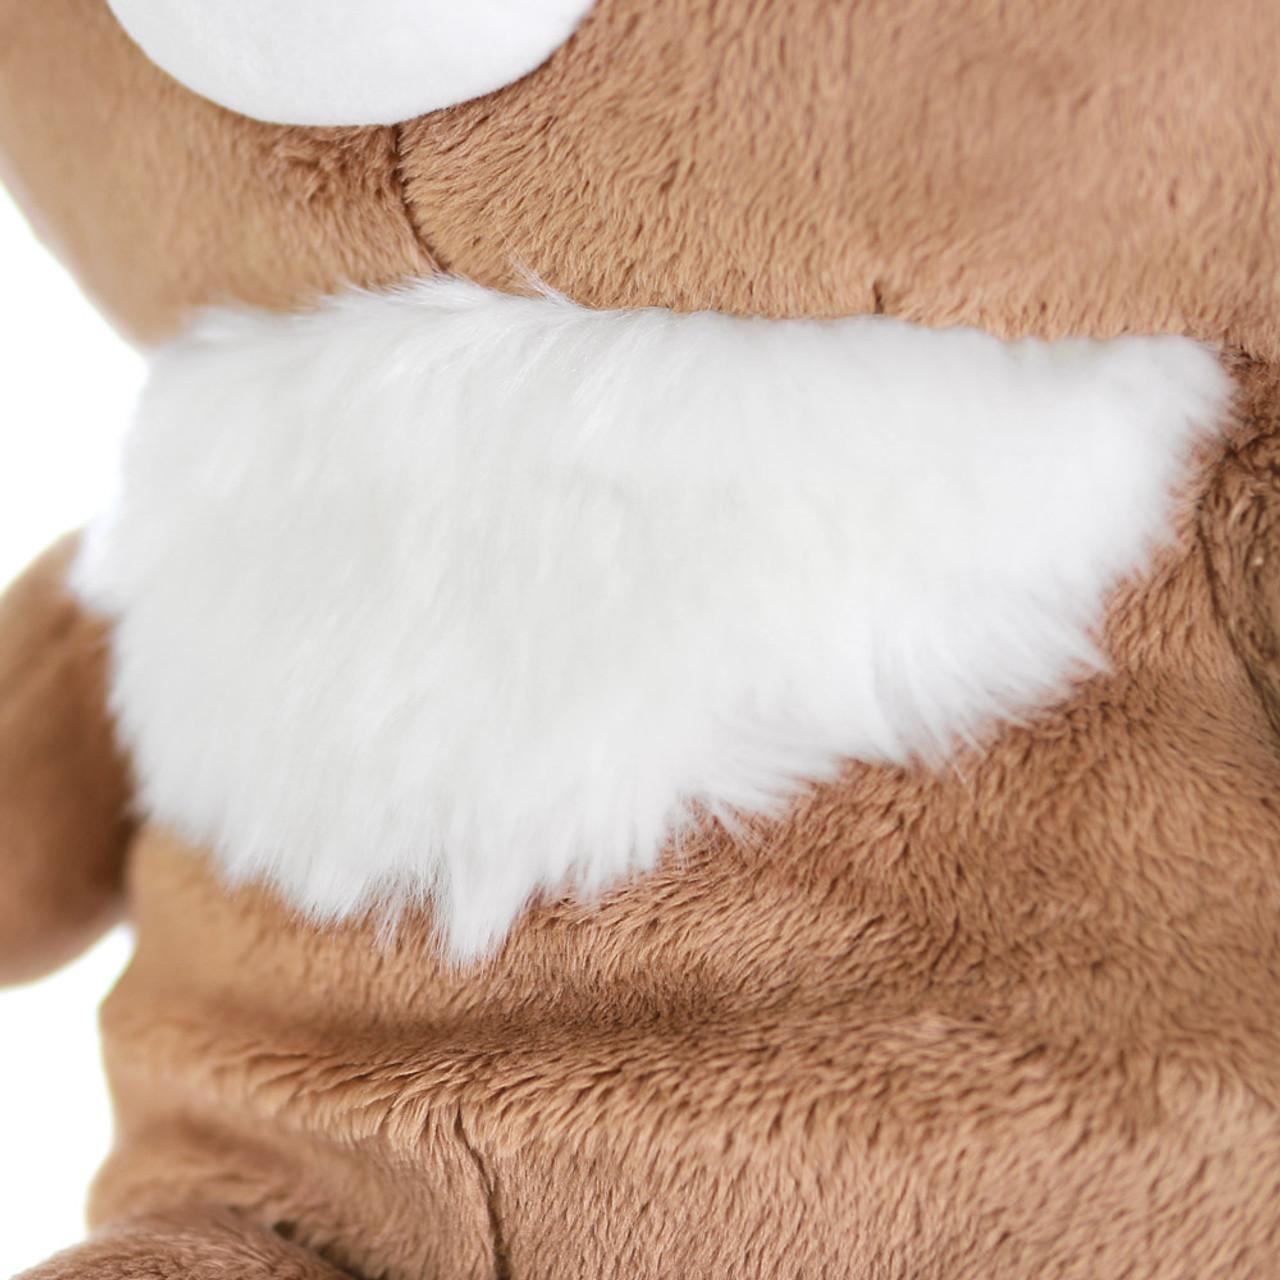 San-x Cute Sweet Chairoikoguma Bear Stuffed Animal Toy L MR94401 ( Chest View )